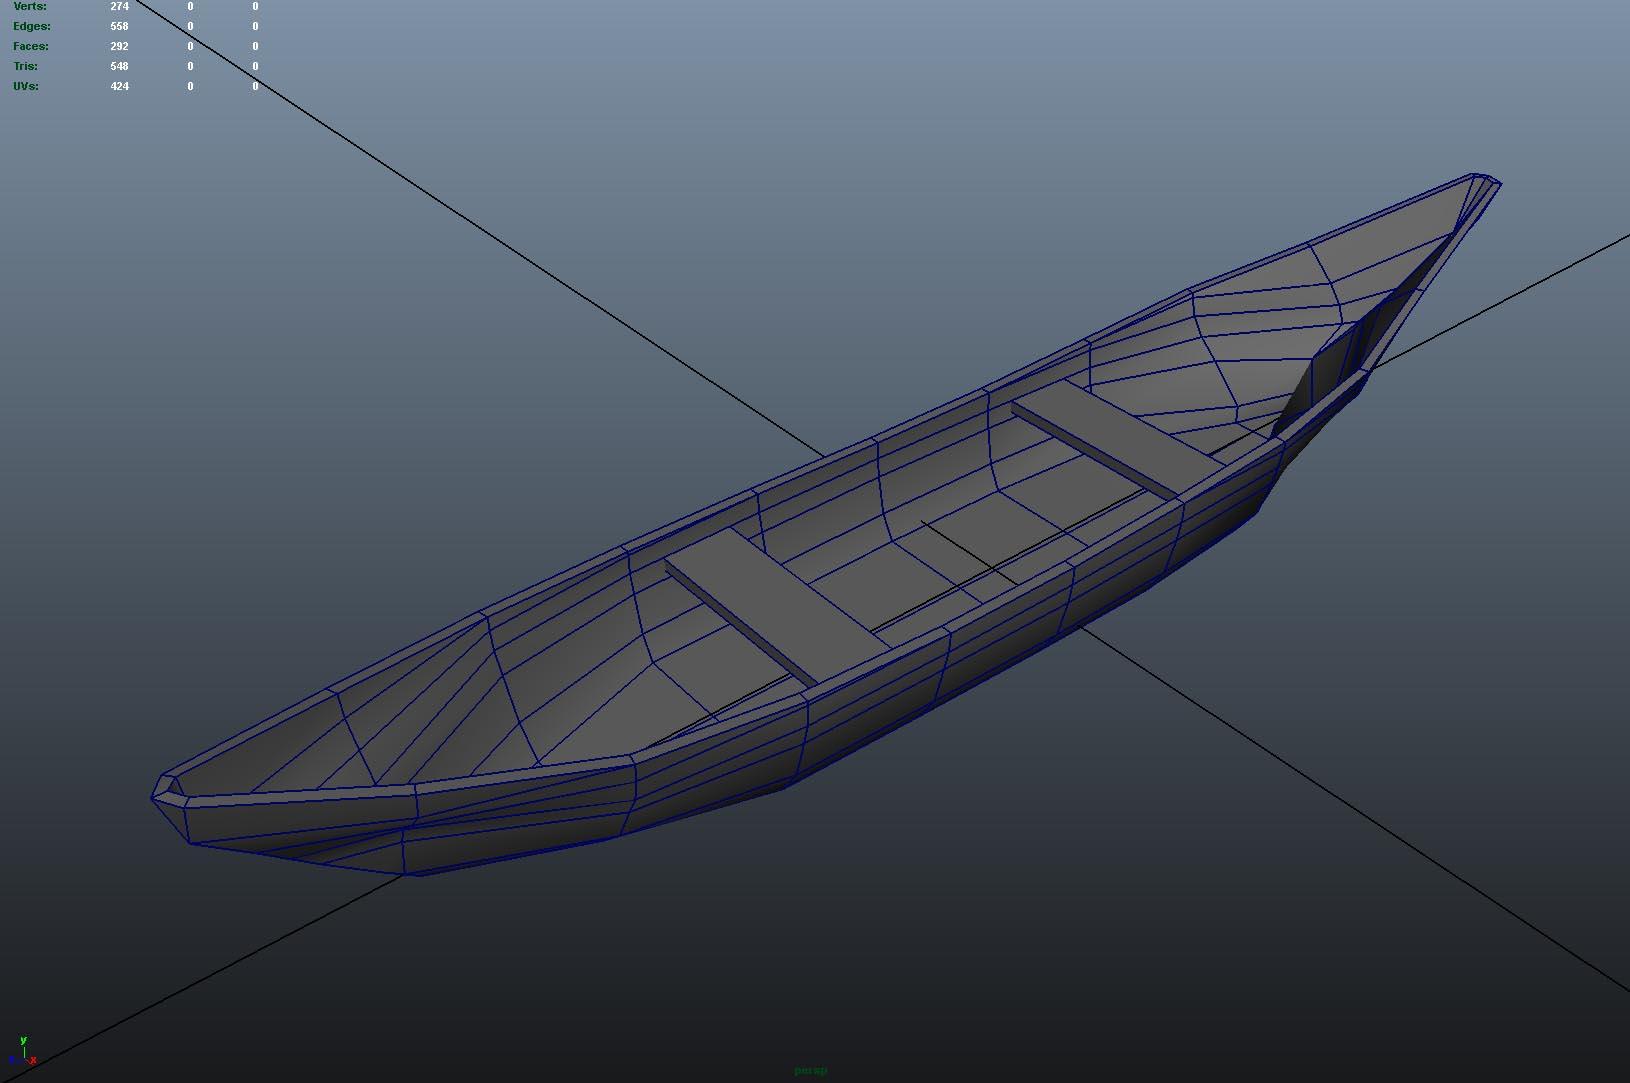 Pacific_Northwest_Canoe_Wireframe.jpg